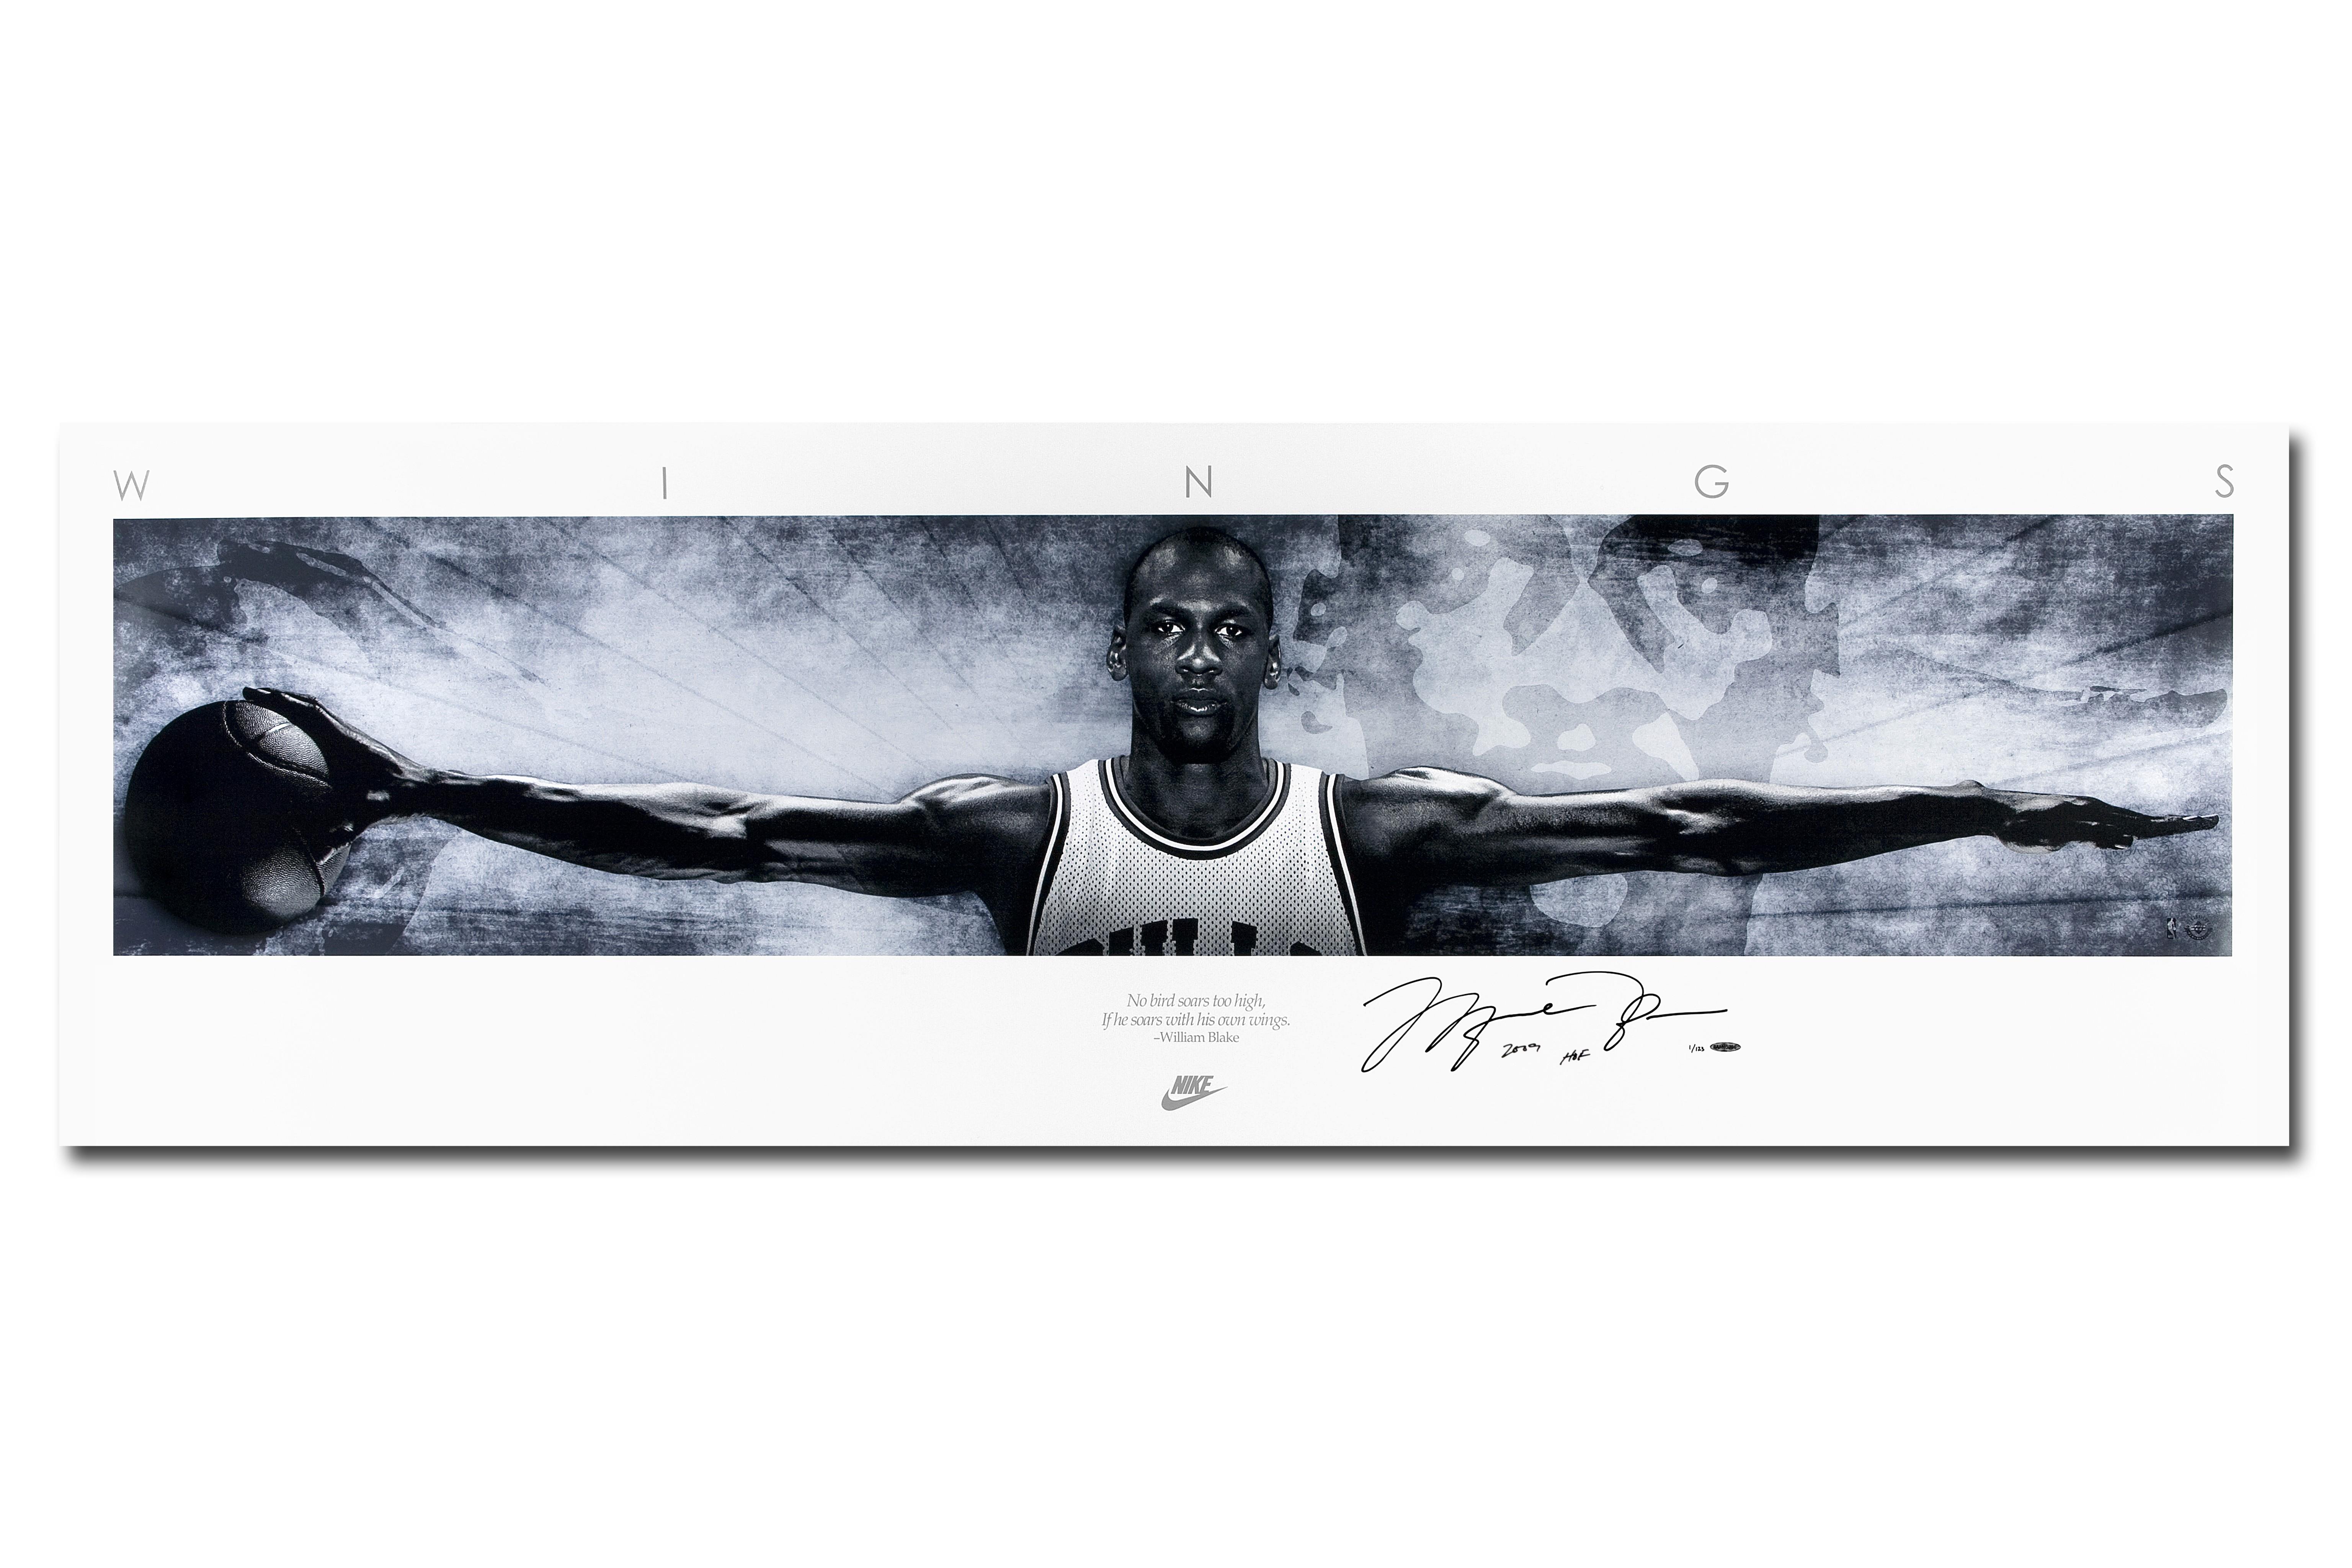 Michael jordan wings poster with frame